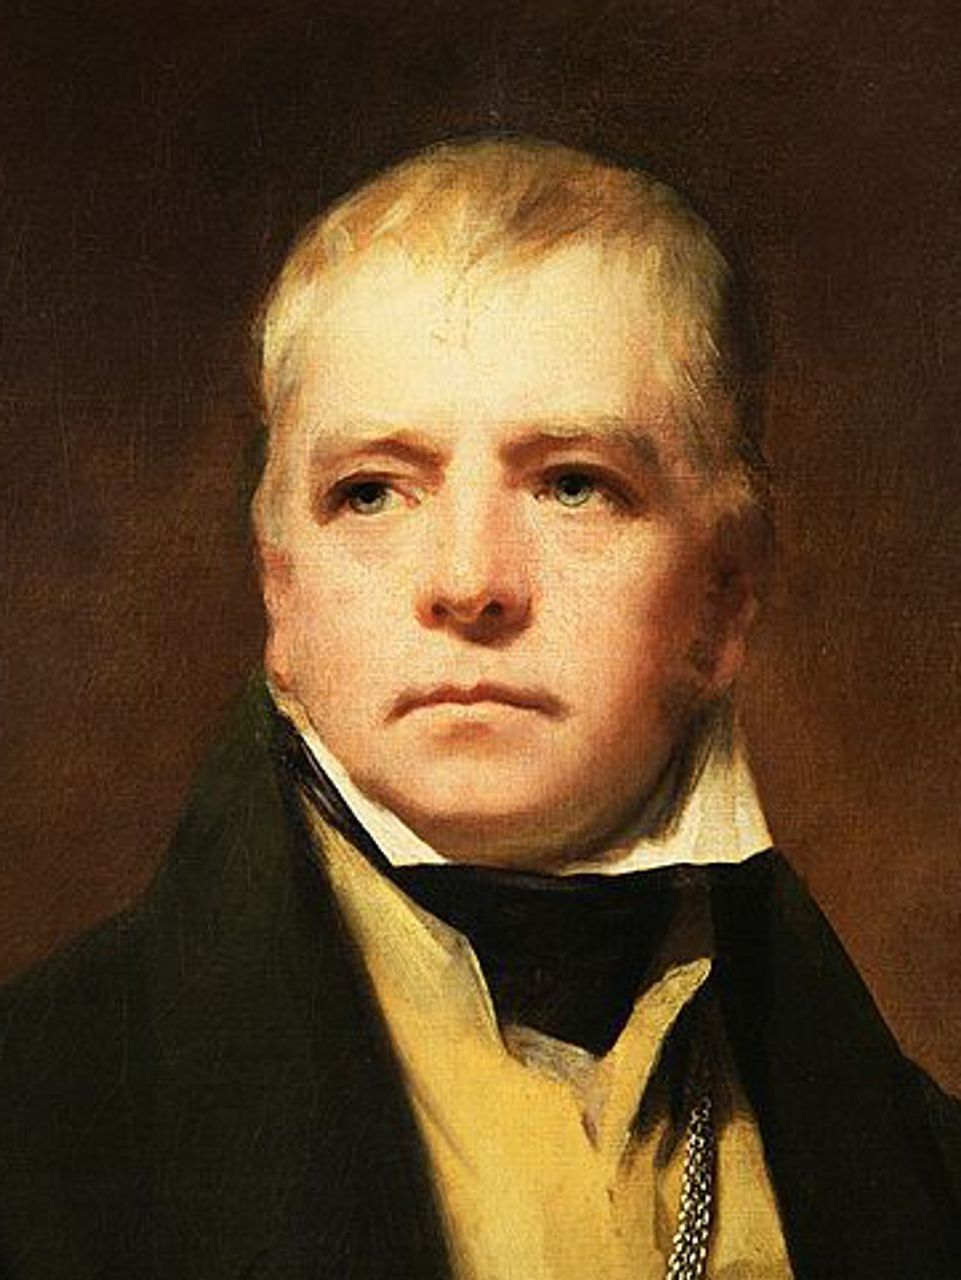 Sir Henry Raeburn's portrait of Sir Walter Scott (1822)